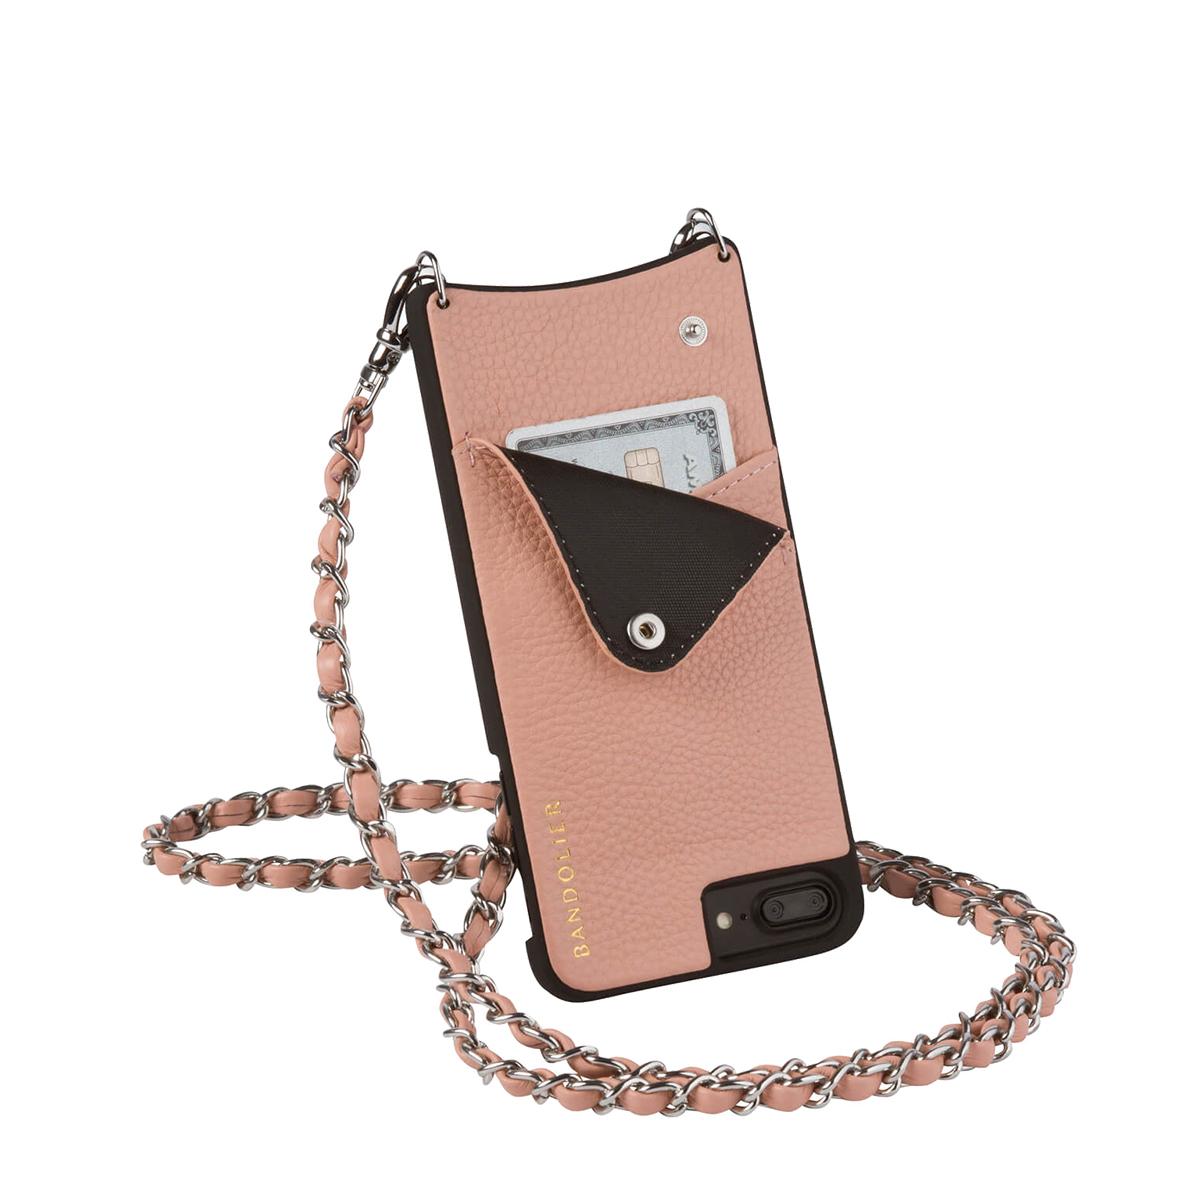 BANDOLIER iPhone8Plus iPhone7Plus 6sPlus LUCY BLUSH バンドリヤー ケース スマホ アイフォン プラス メンズ レディース [1812]